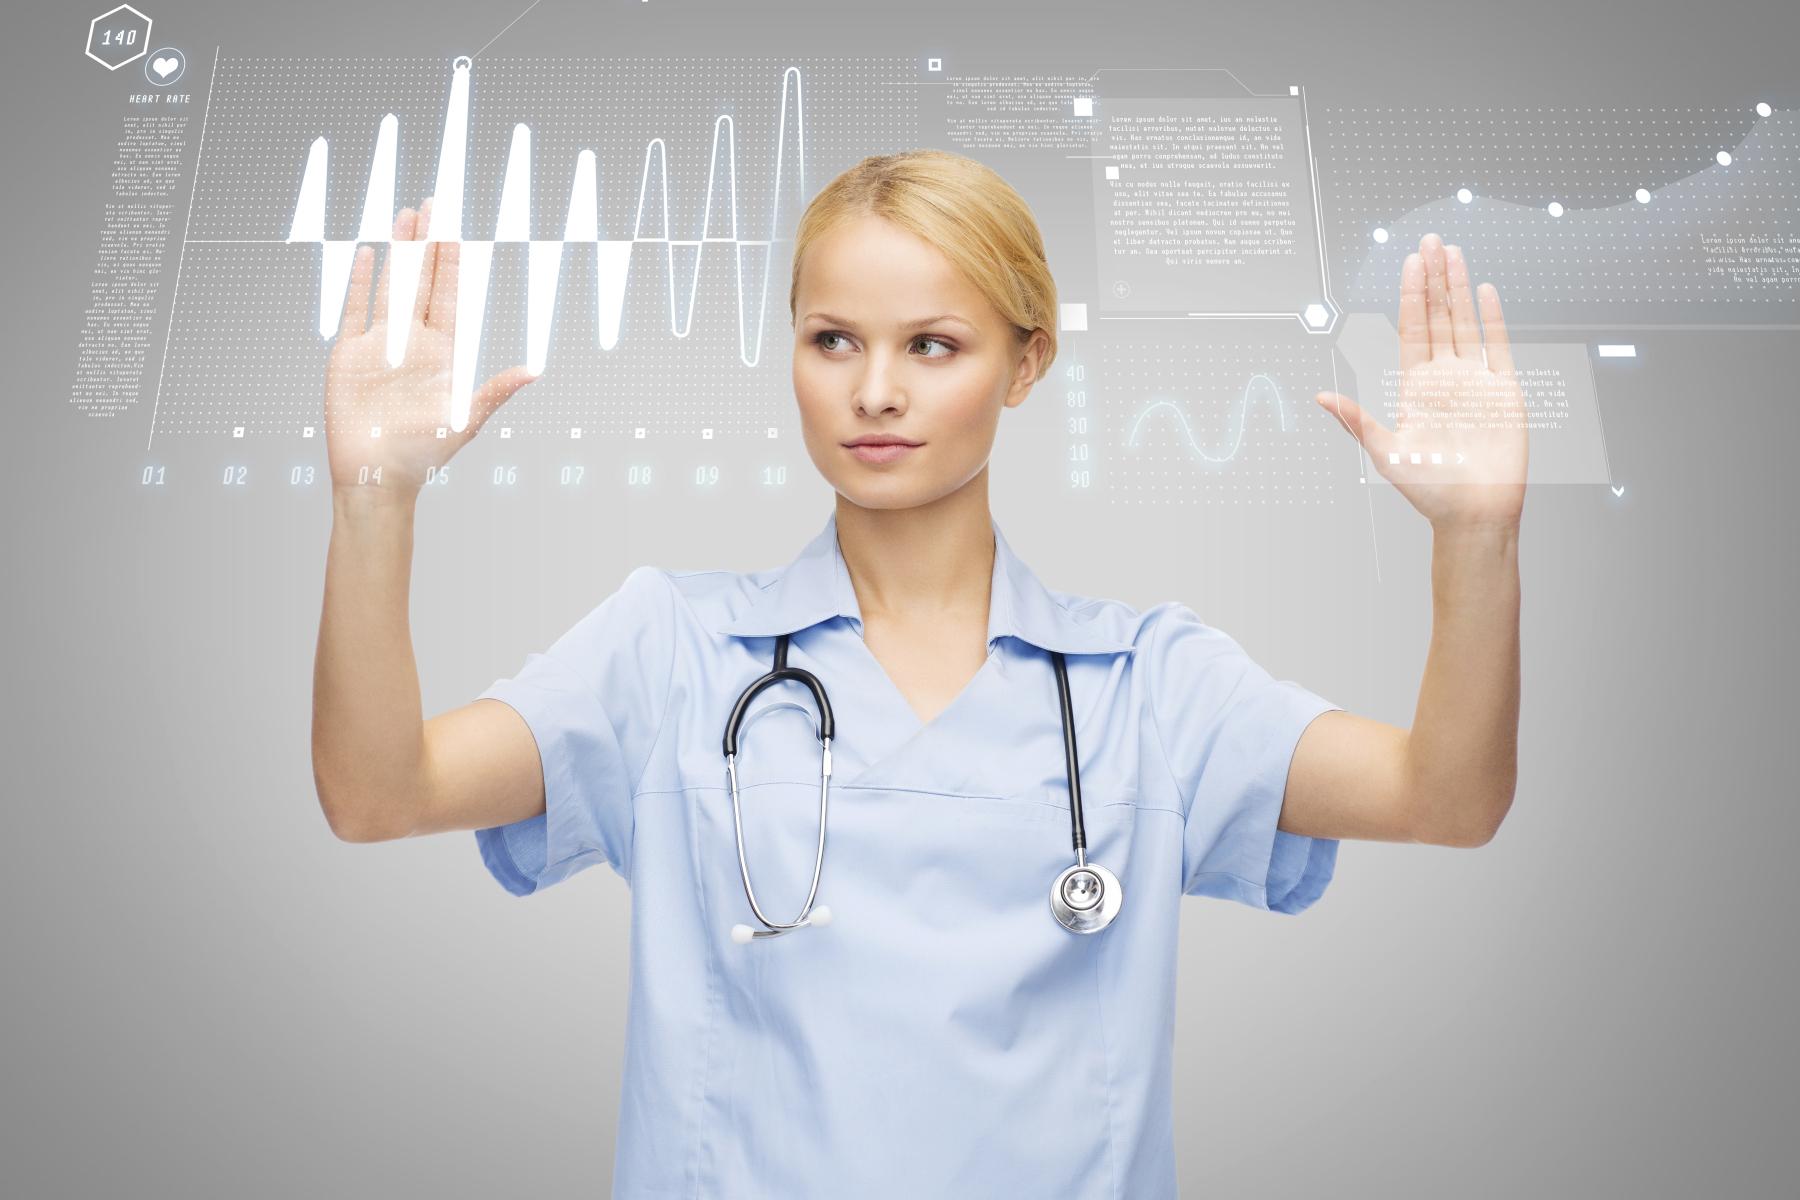 Cardiovascular, Pulmonary Nursing and Cancer Nursing Photo